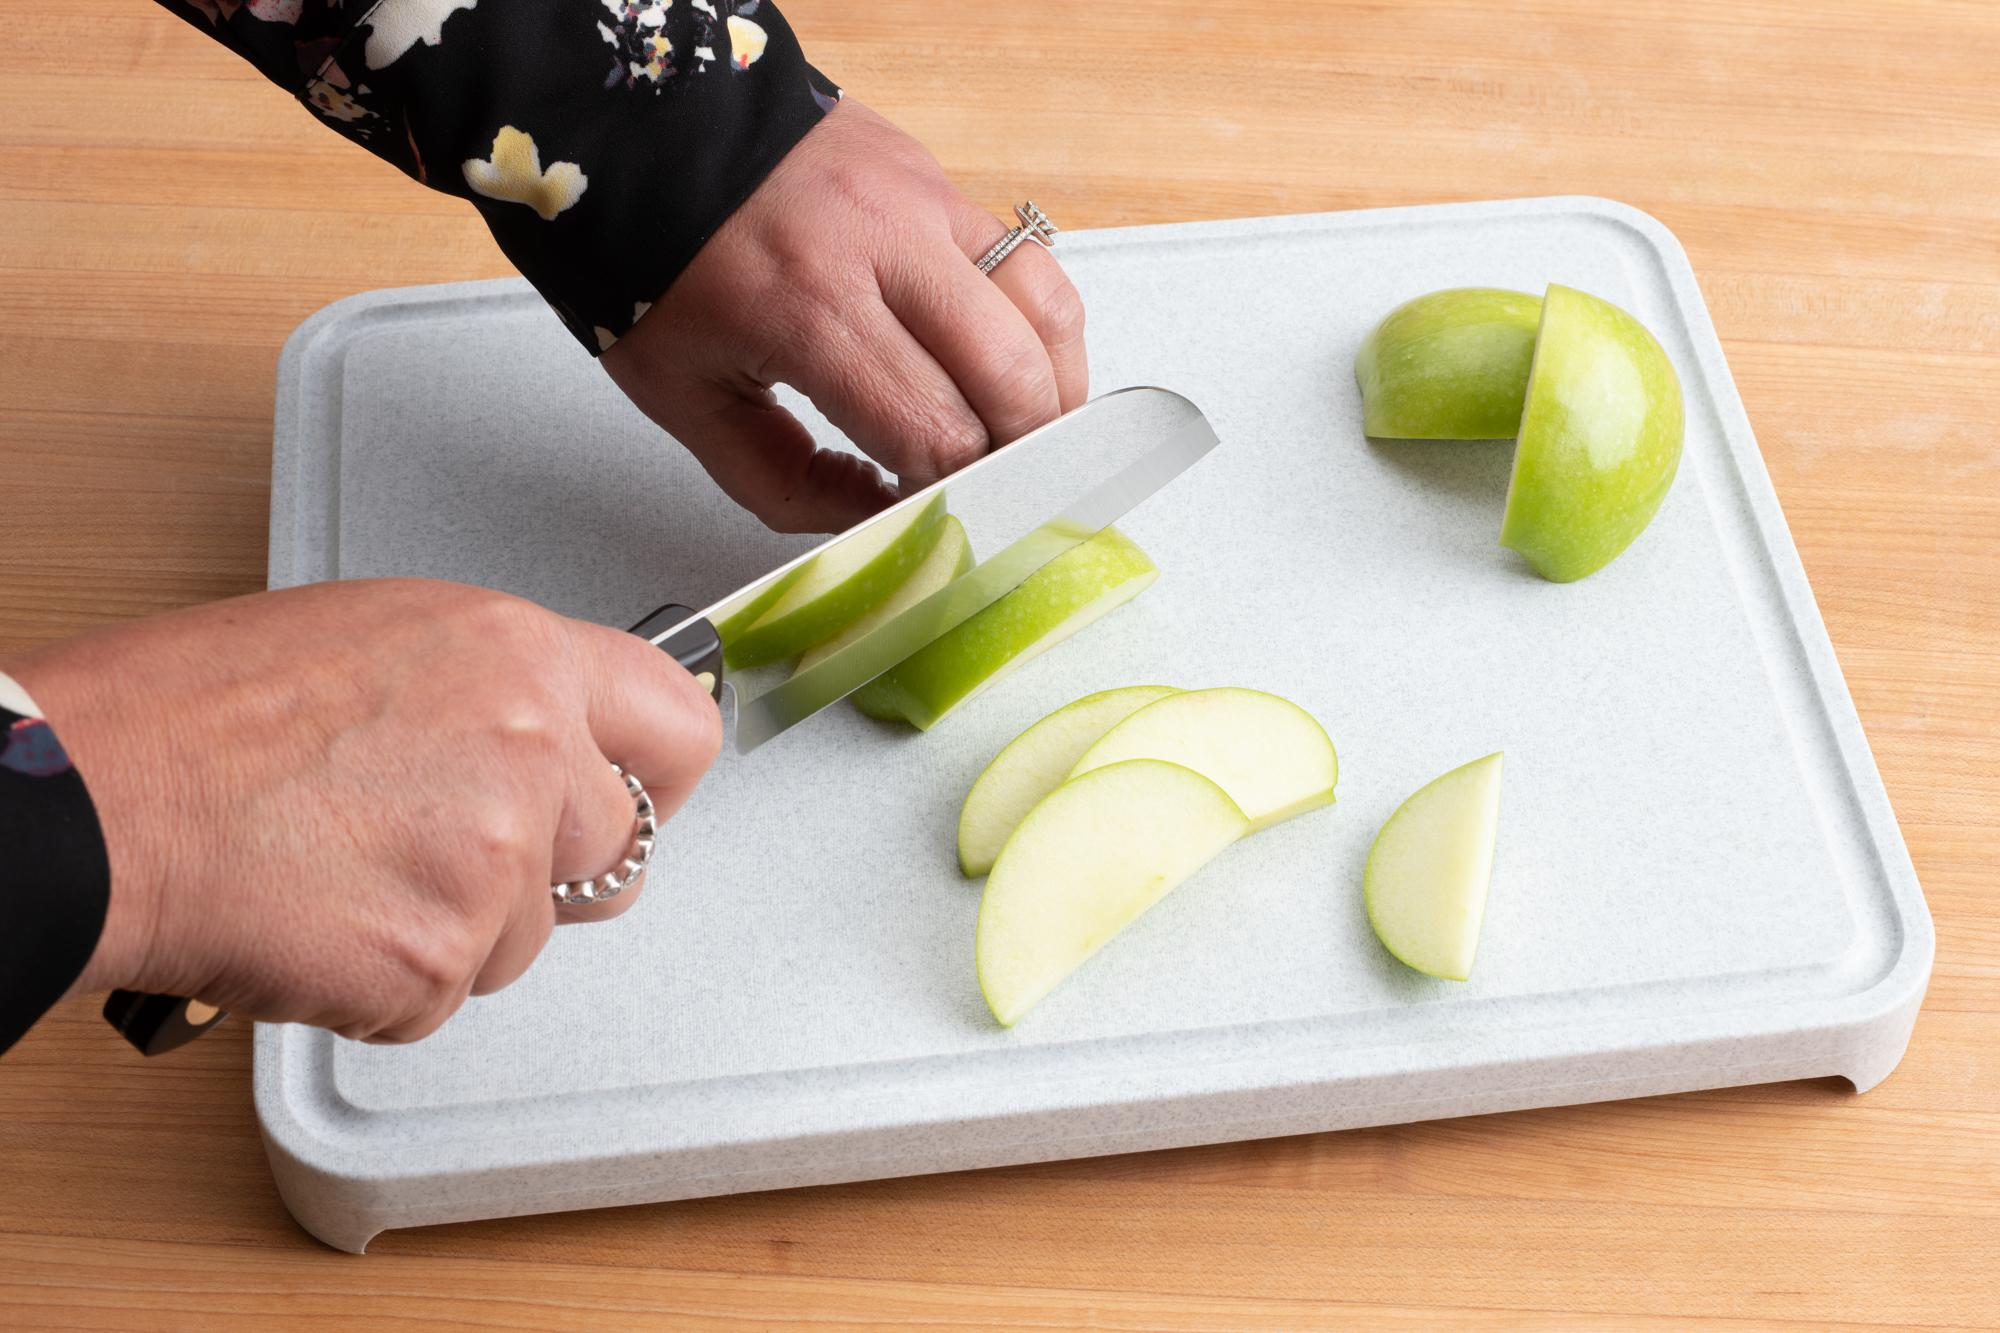 Using the Petite Santoku to thinly slice the apple.